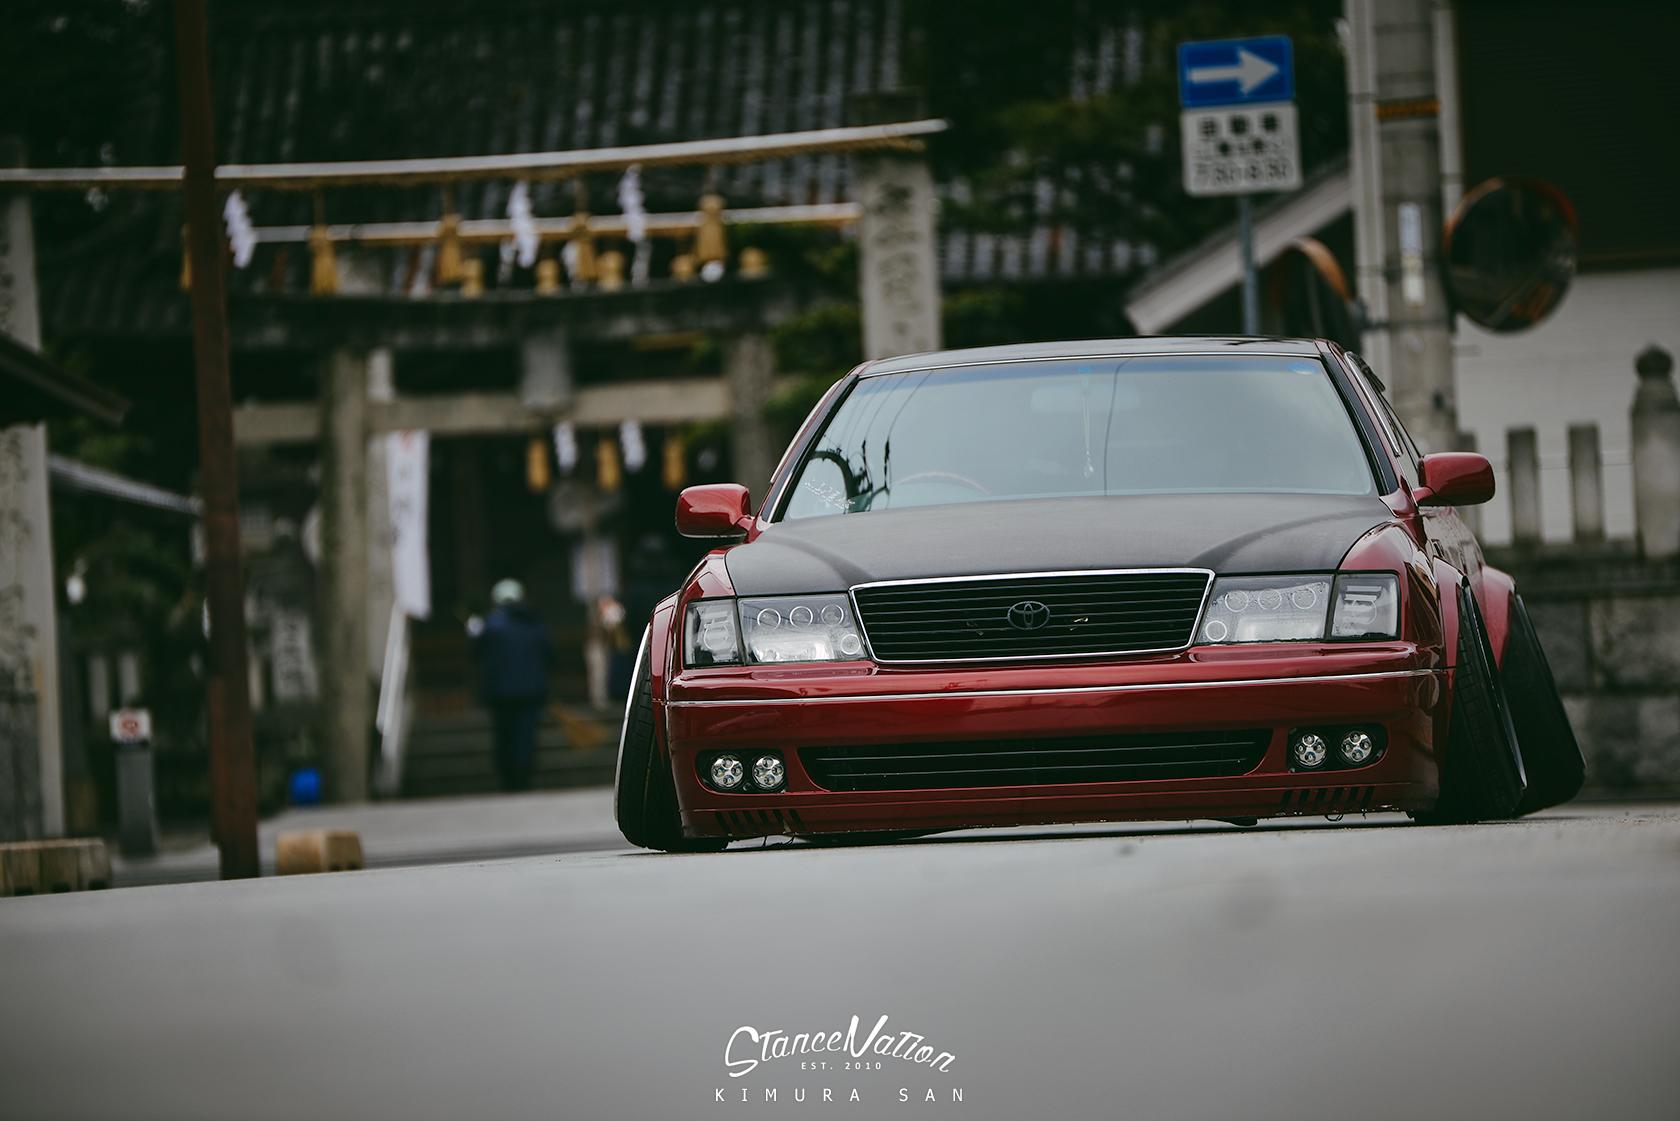 oni-camber-lexus-ls400-japan-vip--5